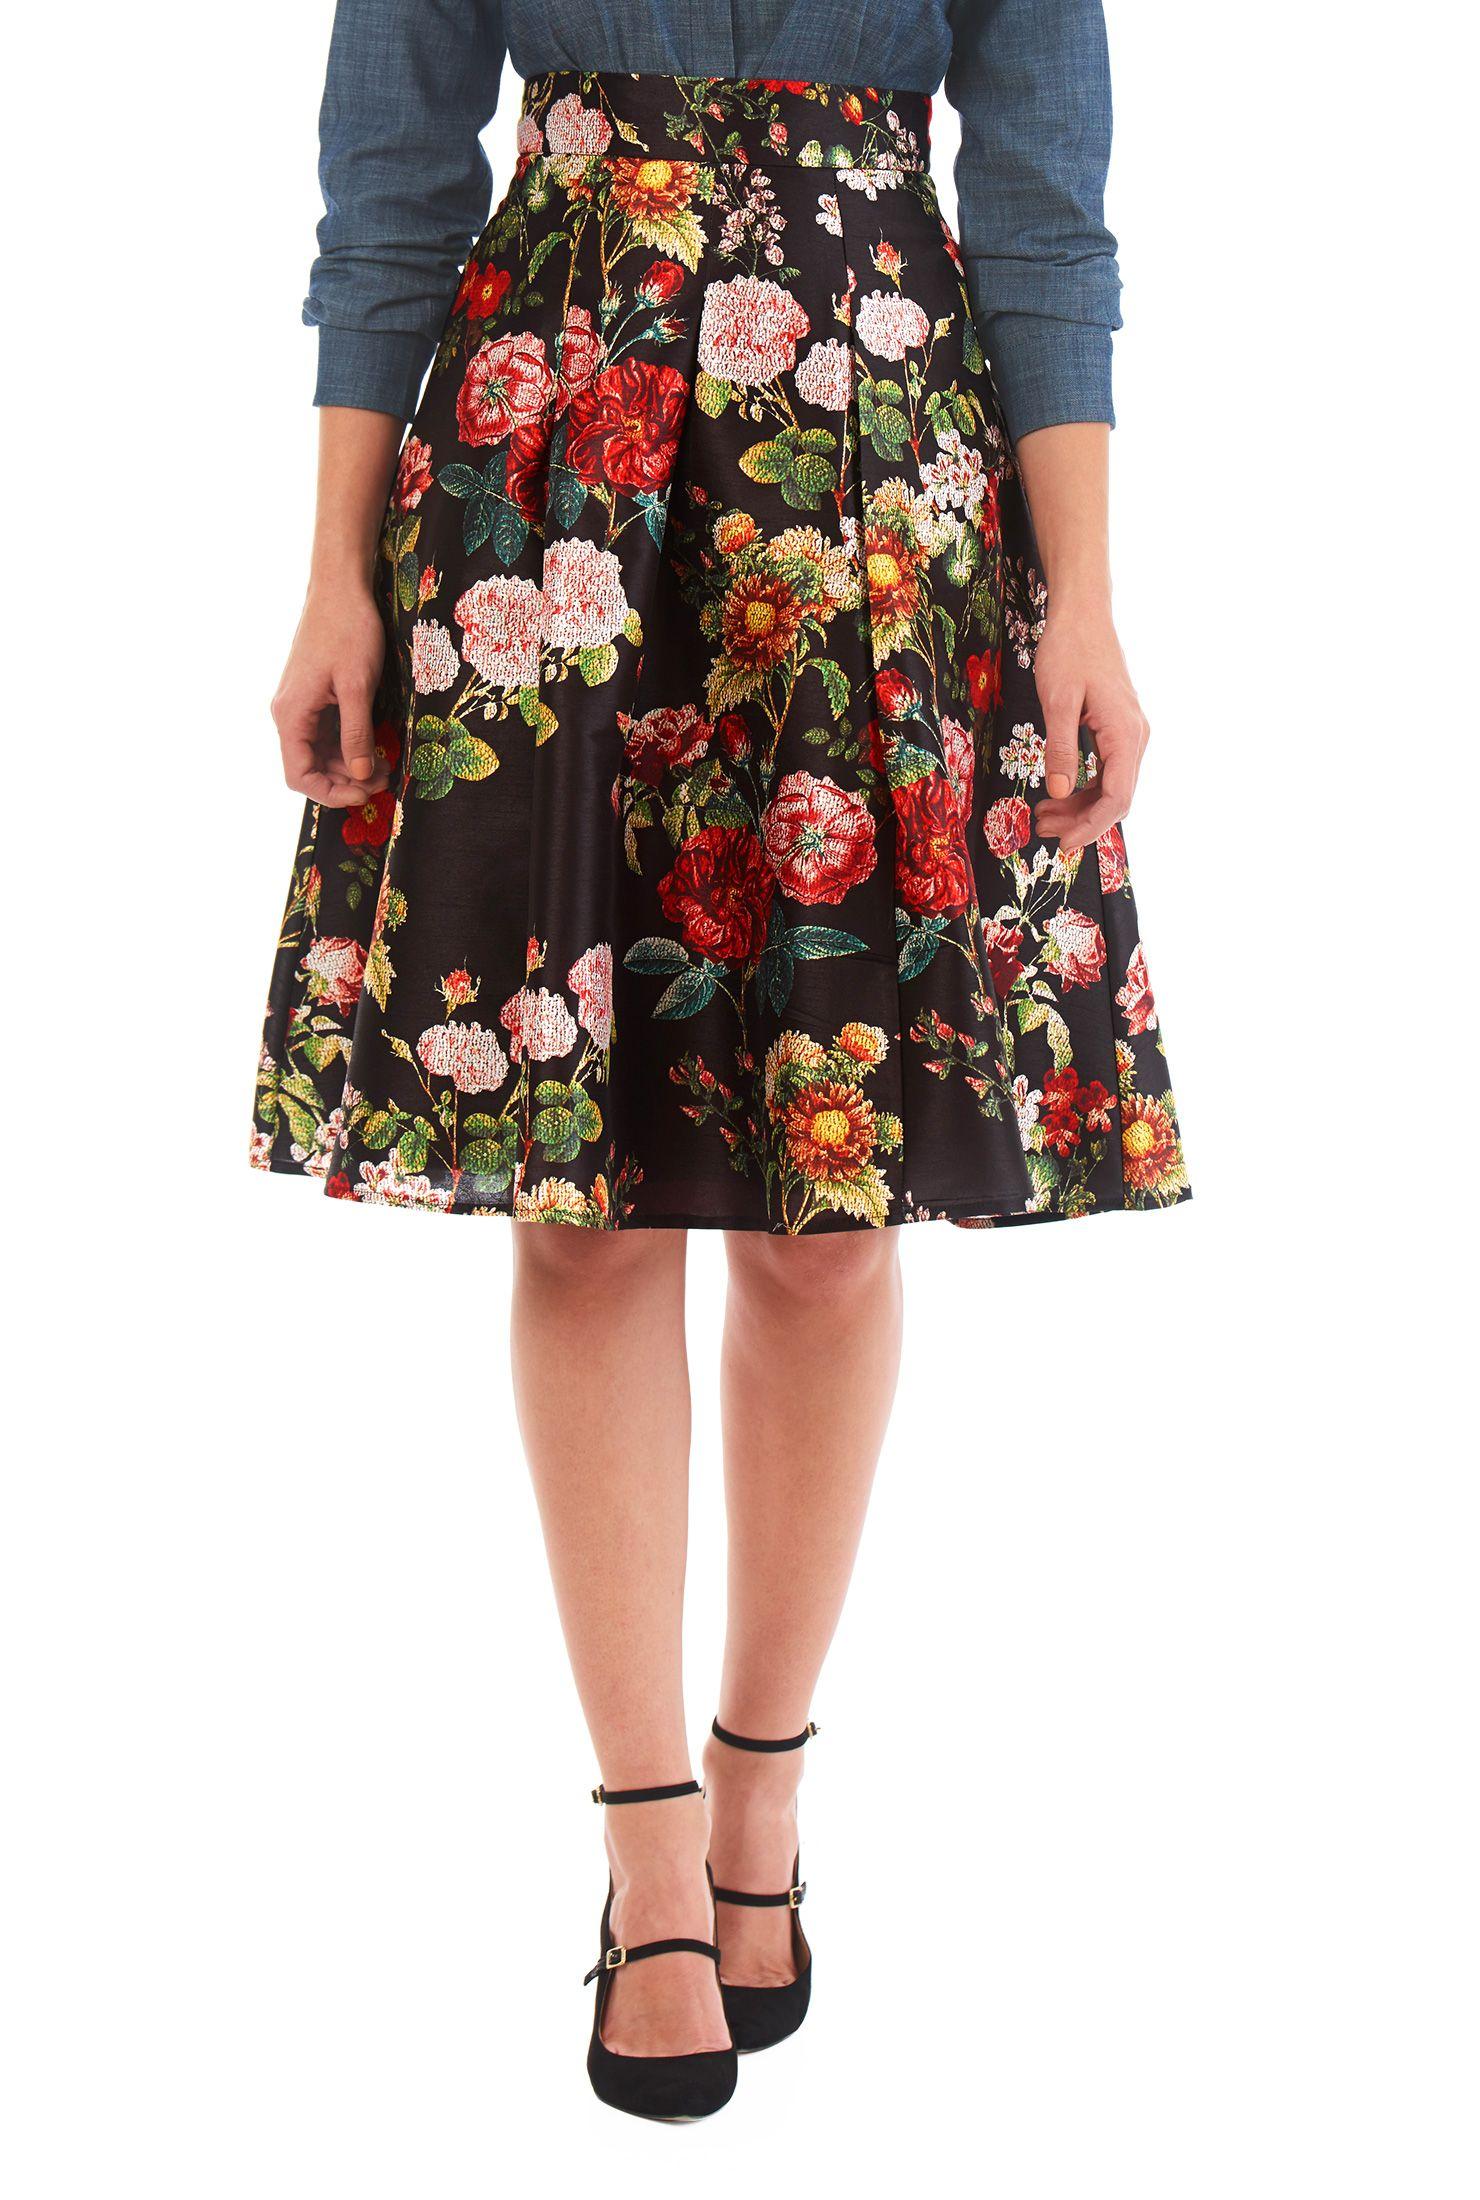 Floral print dupioni pleat skirt  Fashion clothes women, Fashion